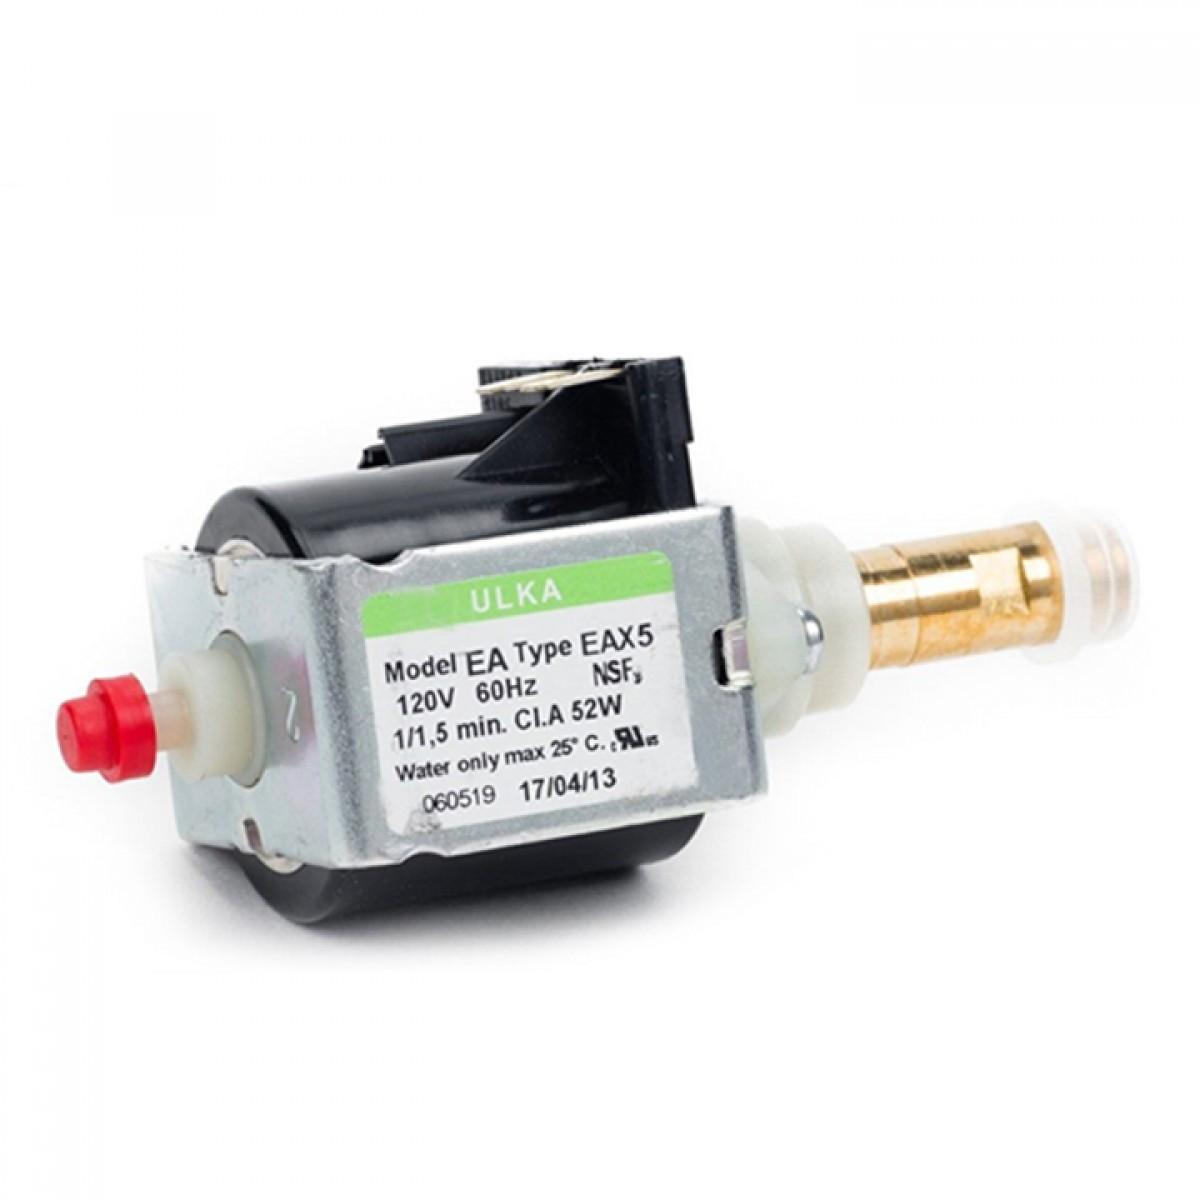 Ulka Vibration Water Pump EAX5